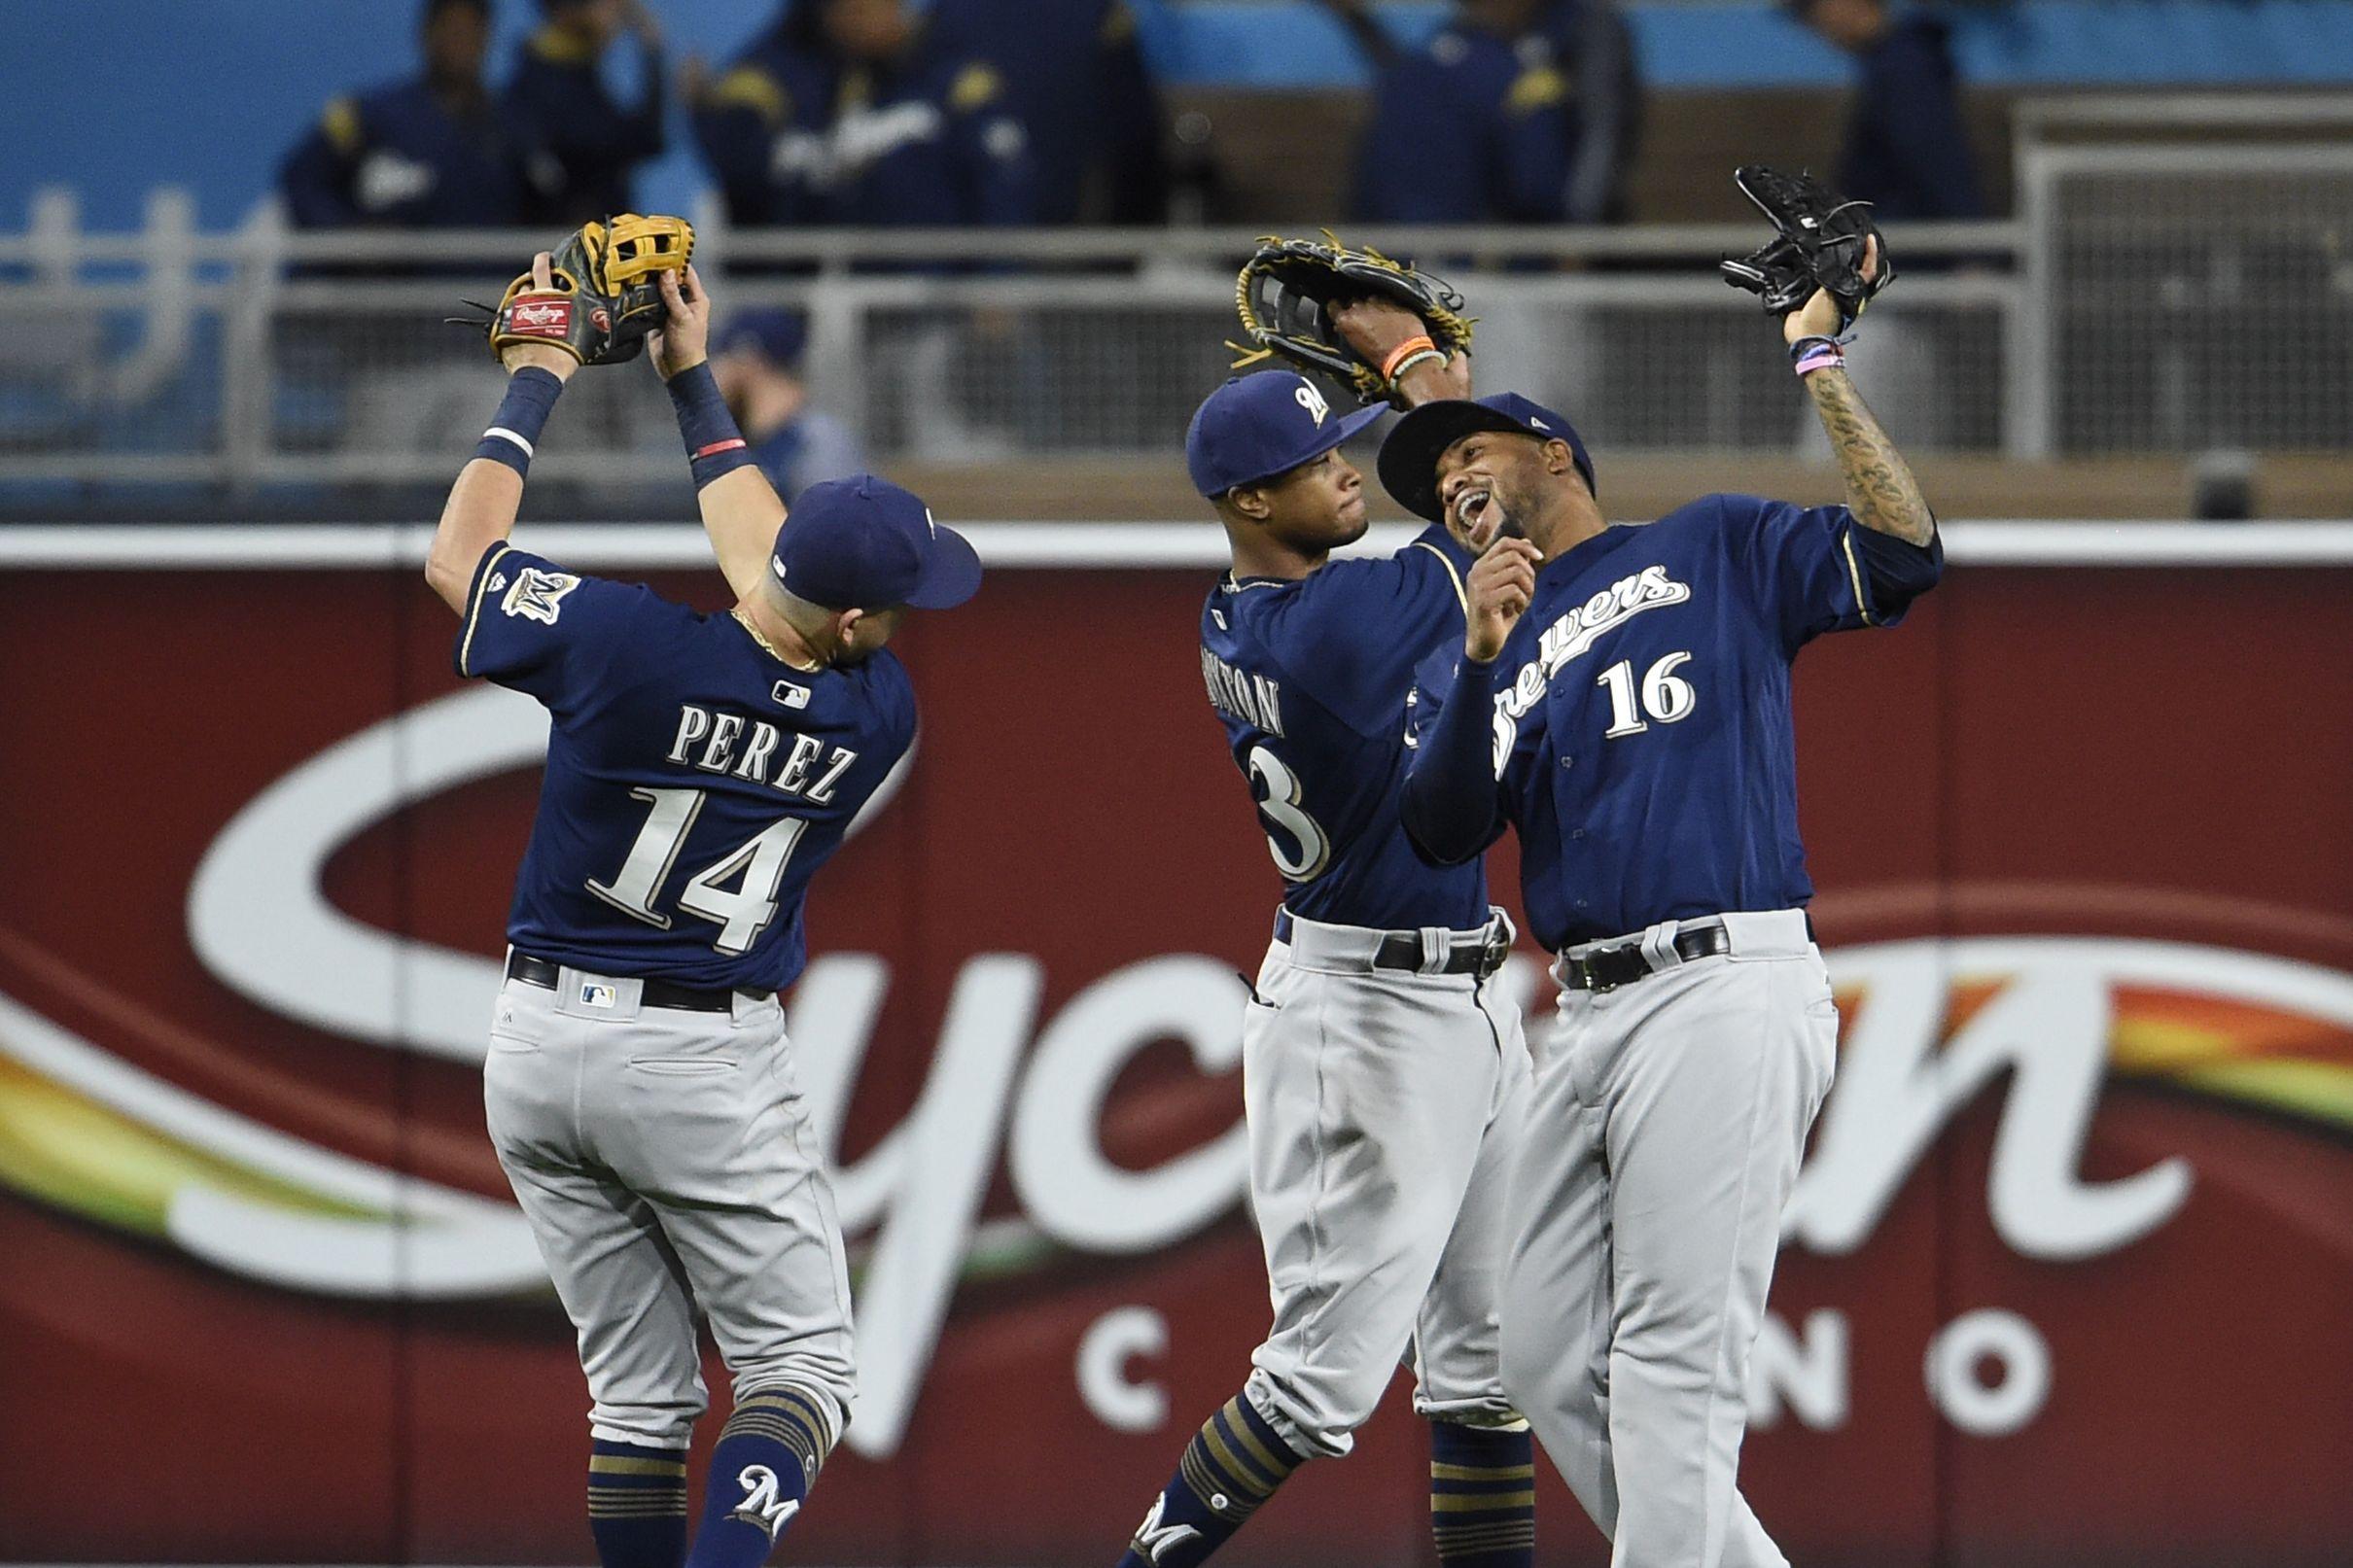 Facebook Will Stream 20 Mlb Games For Free This Season Baseball Live Sports Baseball Basketball Game Tickets